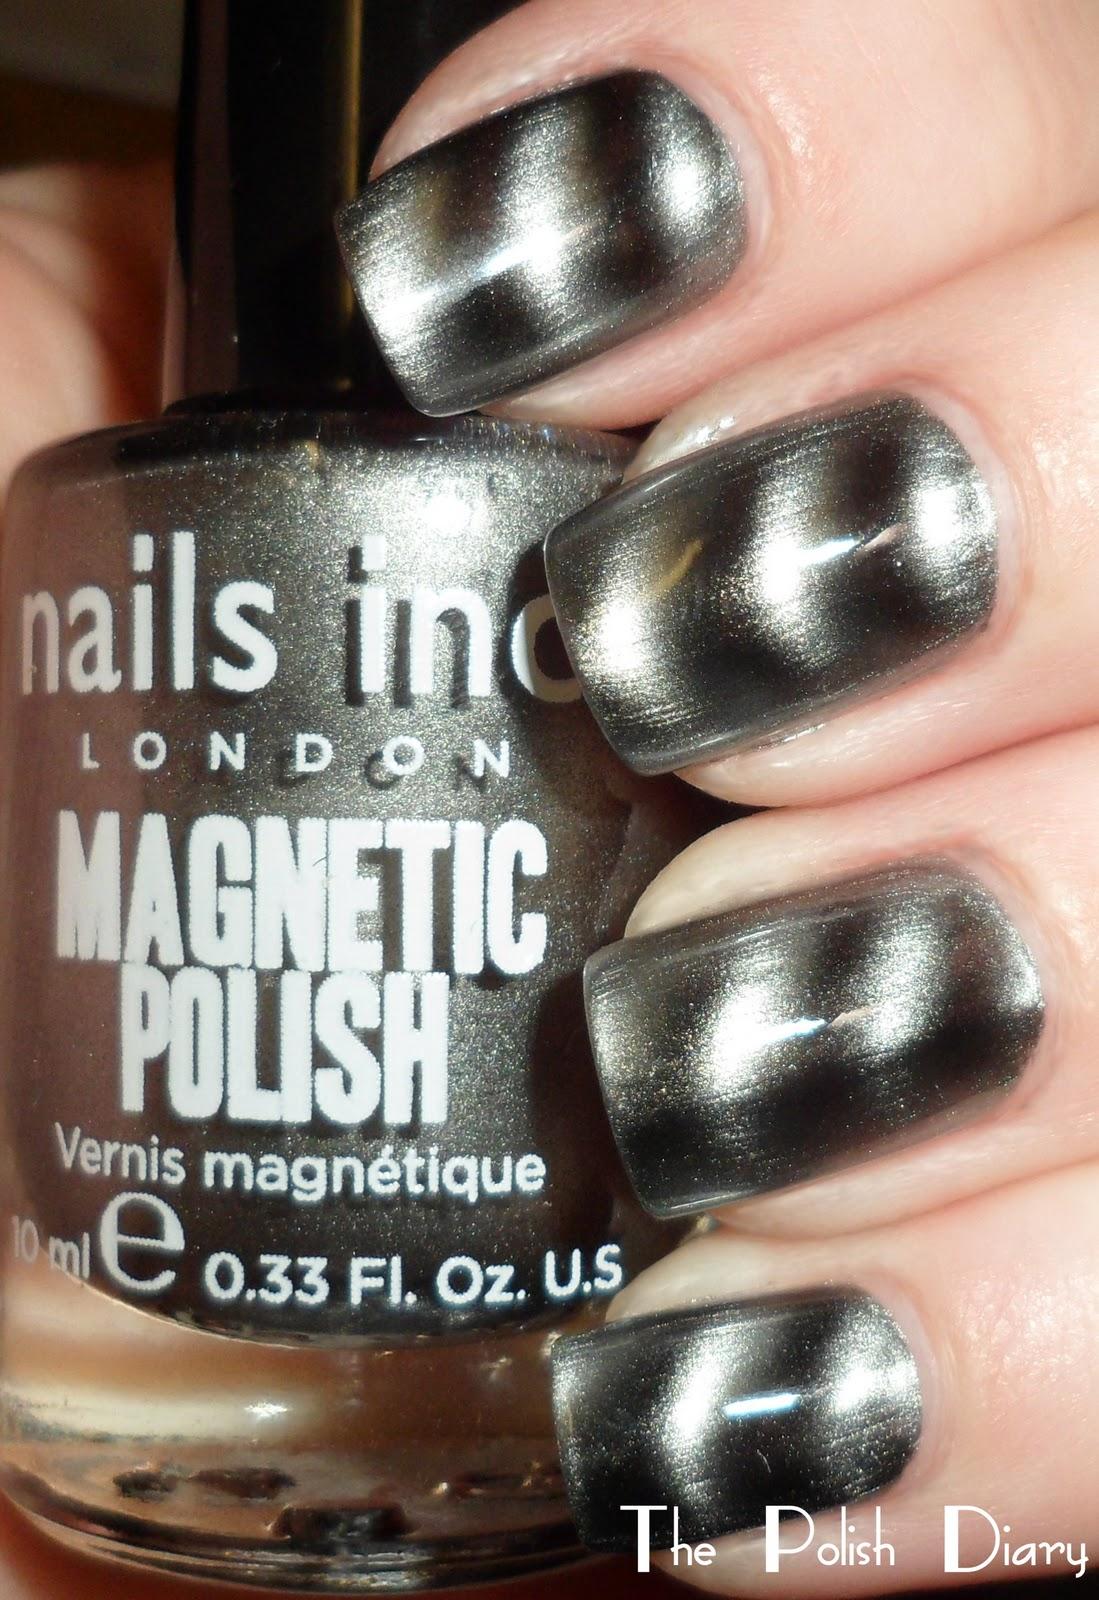 The Polish Diary: Nails Inc. - Trafalgar Square (Magnetic)